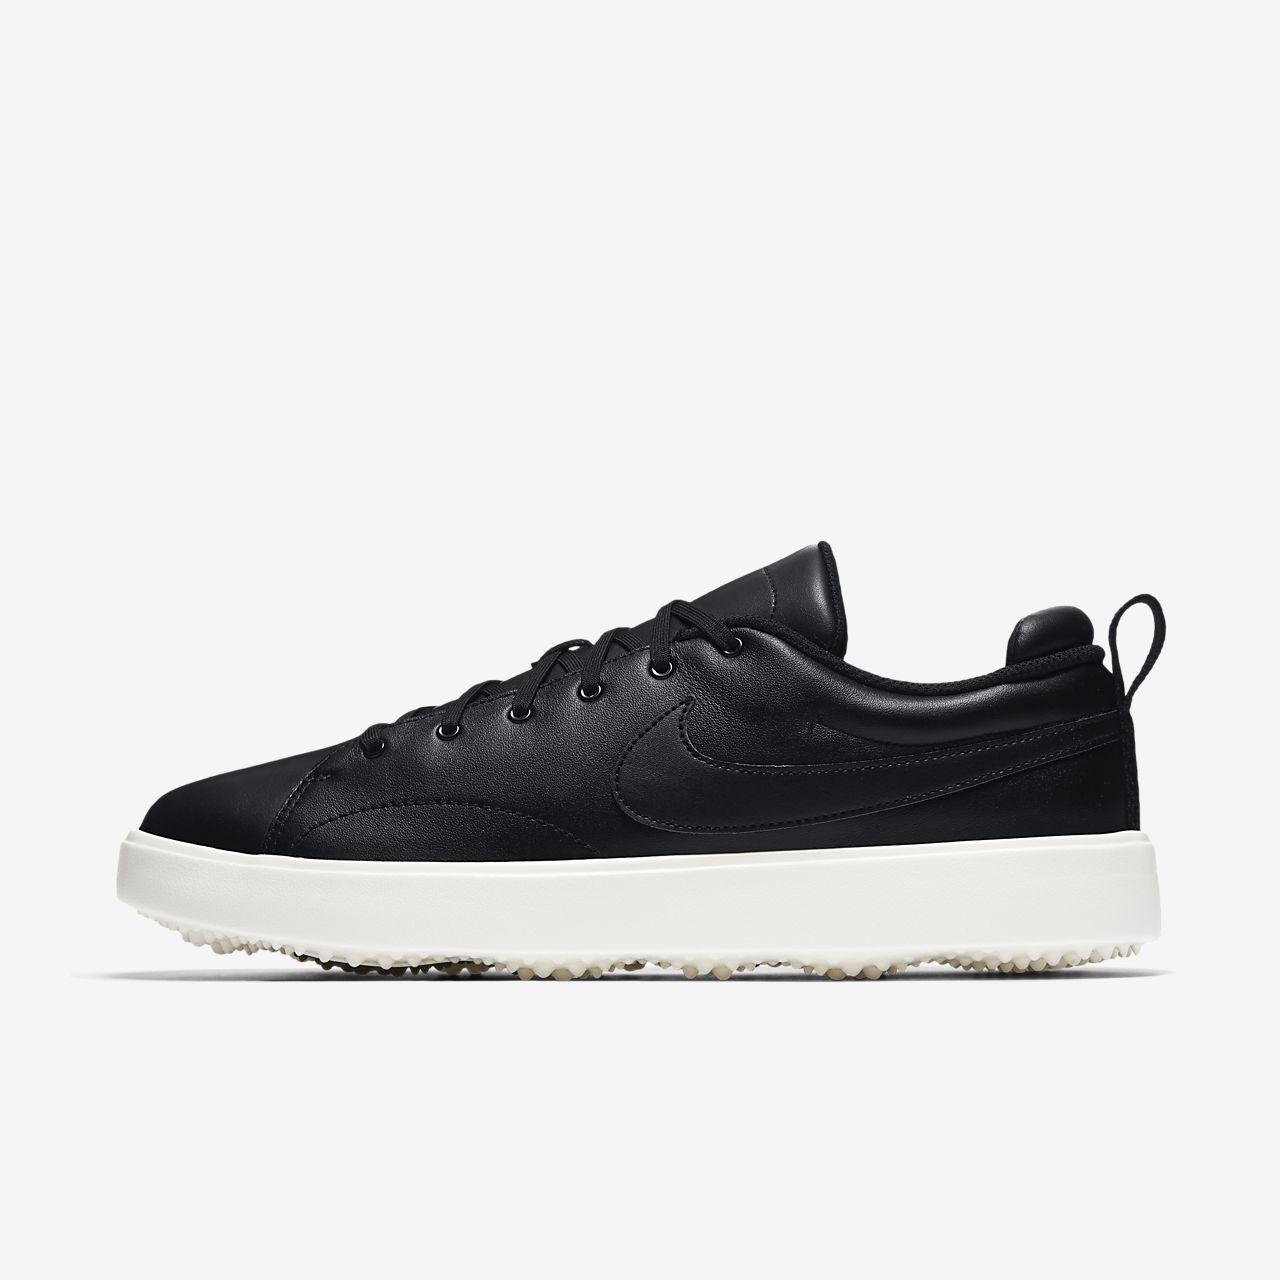 Nike Cours Heren Classique xi3Id5gNP